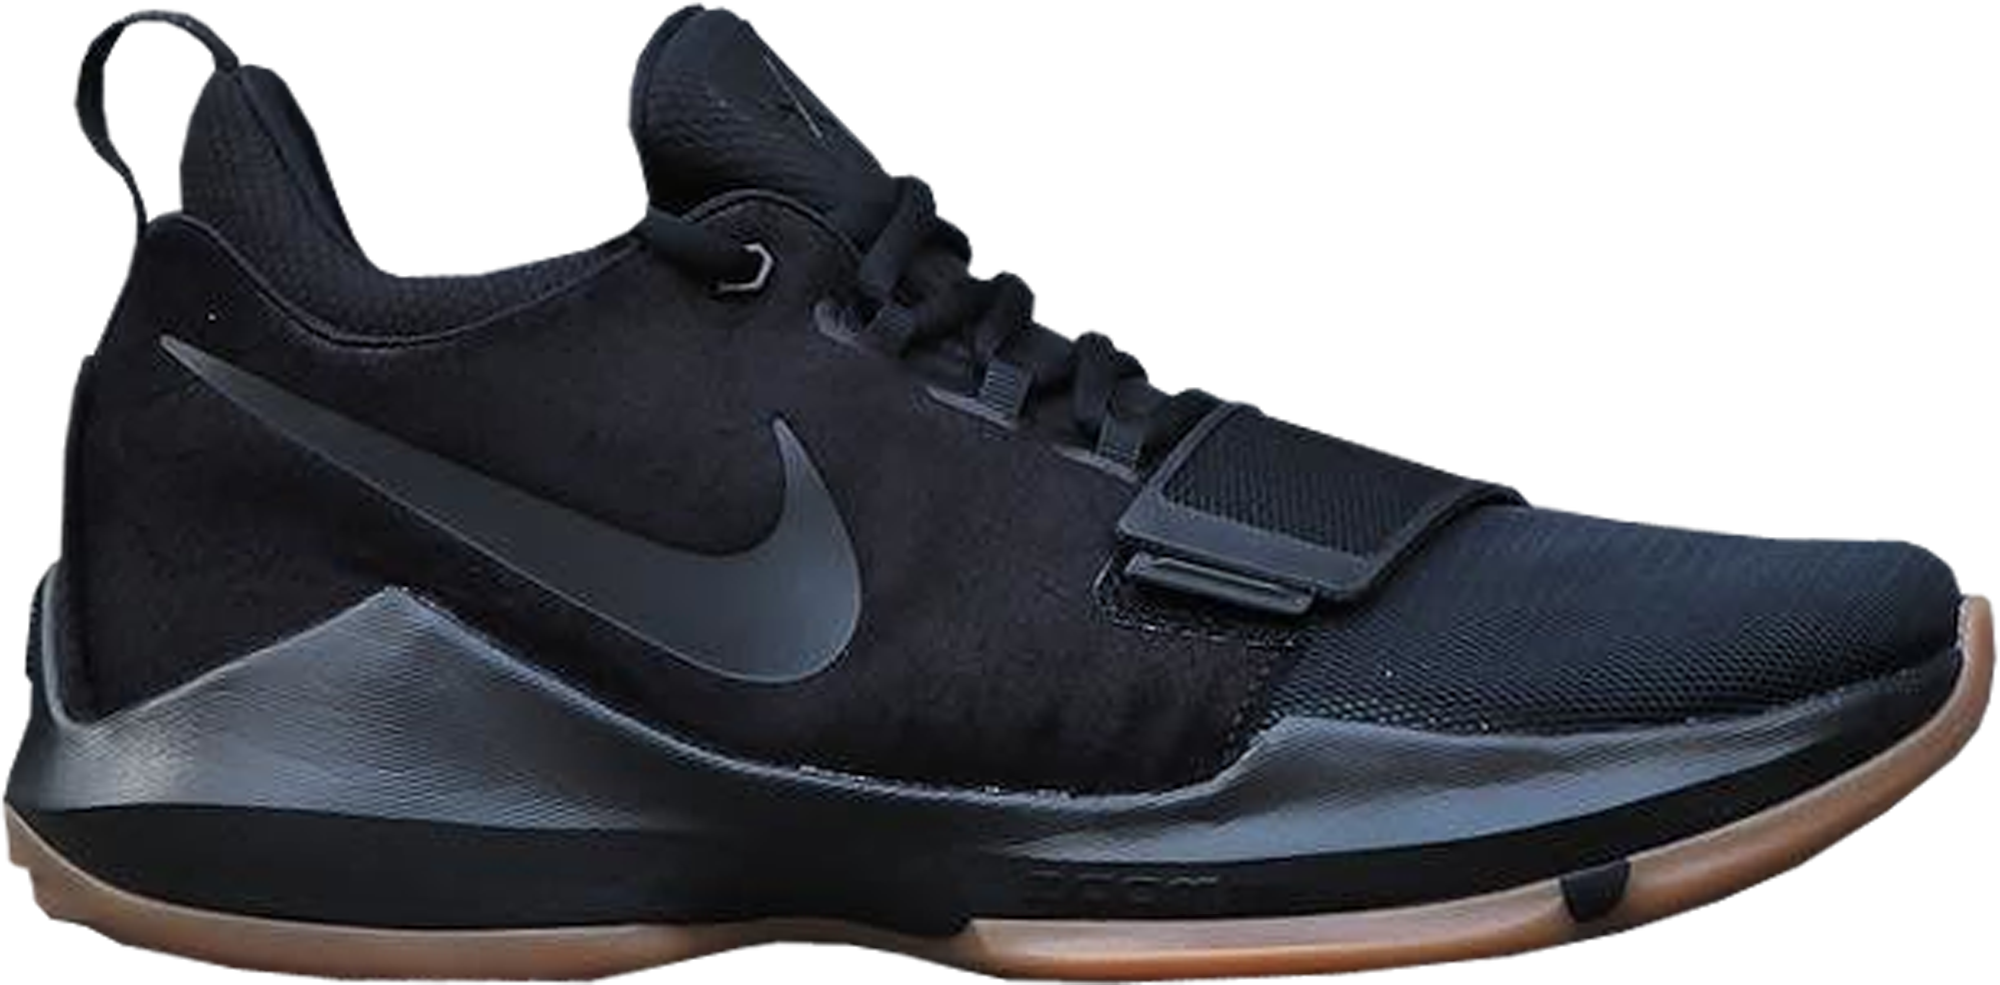 Nike PG 1 Black Gum